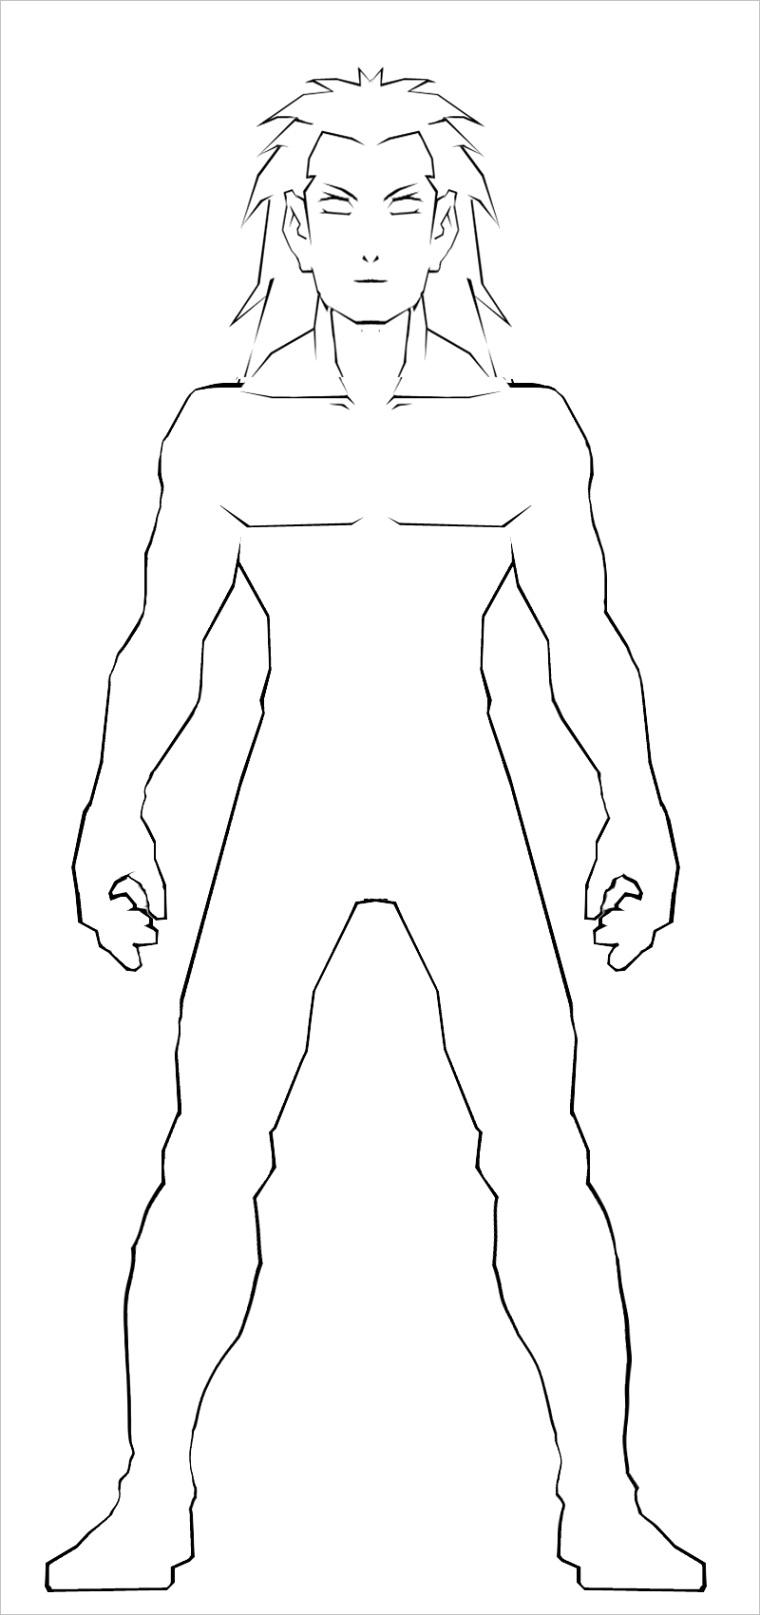 male body template 2